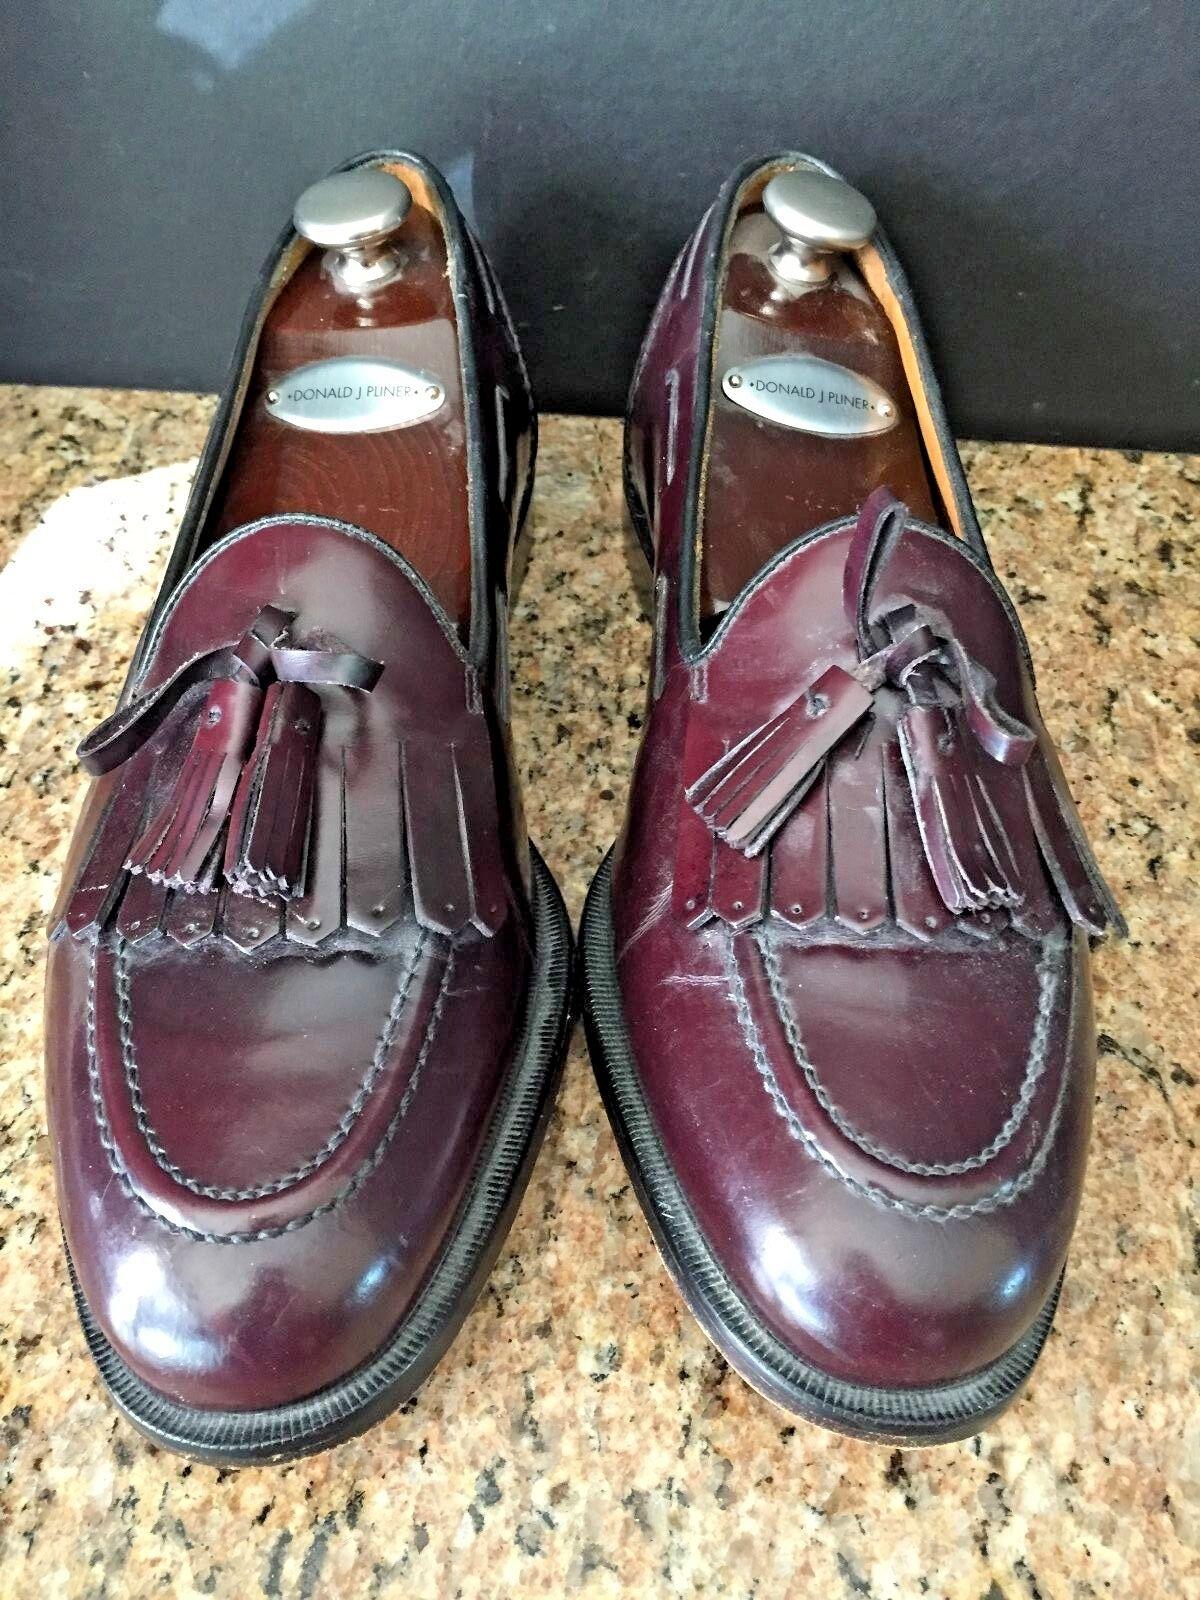 COLE HAAN para hombre Borla Flecos cordobés Mocasín Cuero Zapatos slip, en